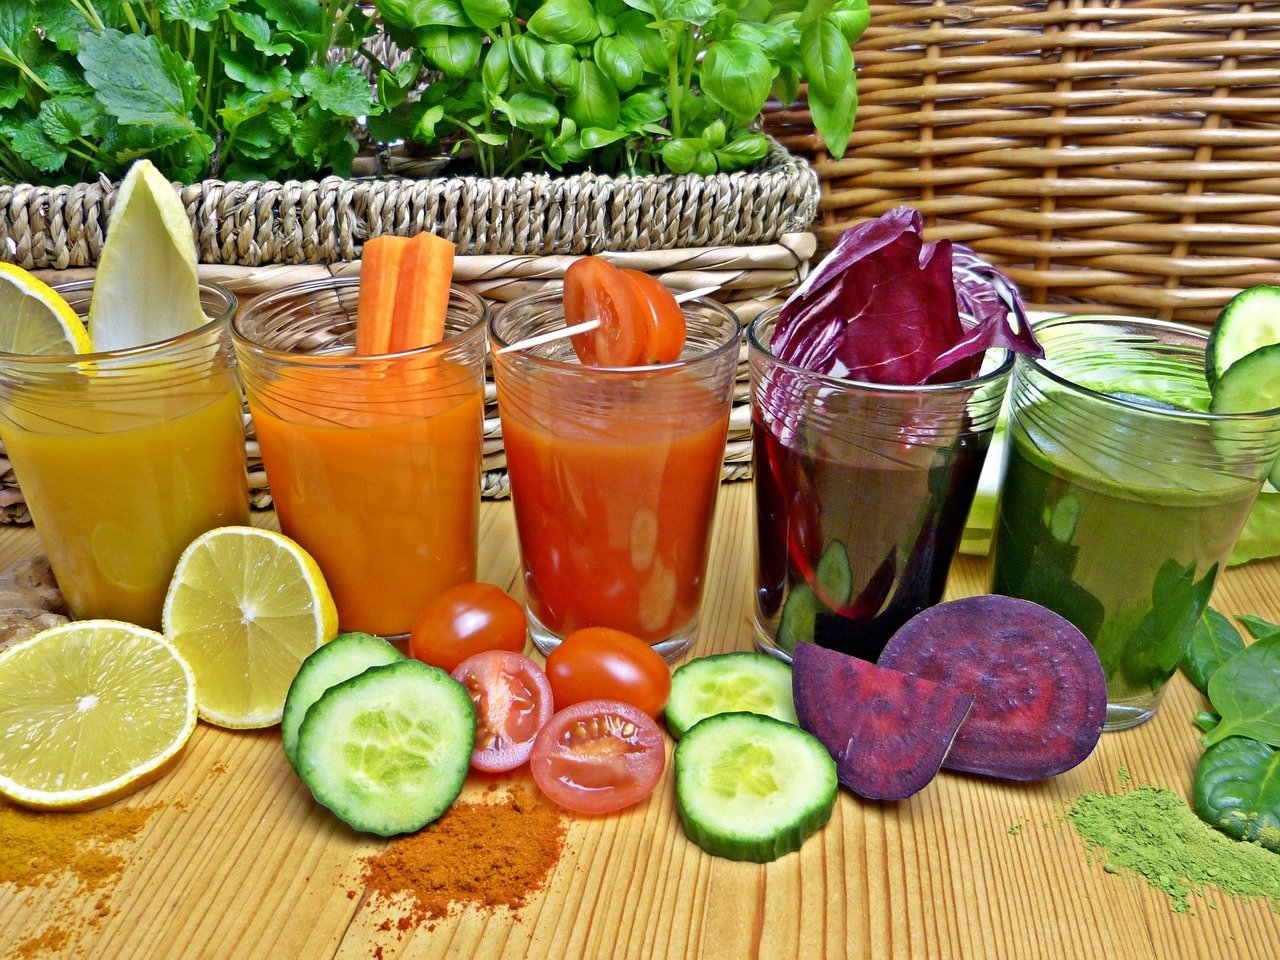 Detox Detoxify Diet Vitamins Healthy Fresh